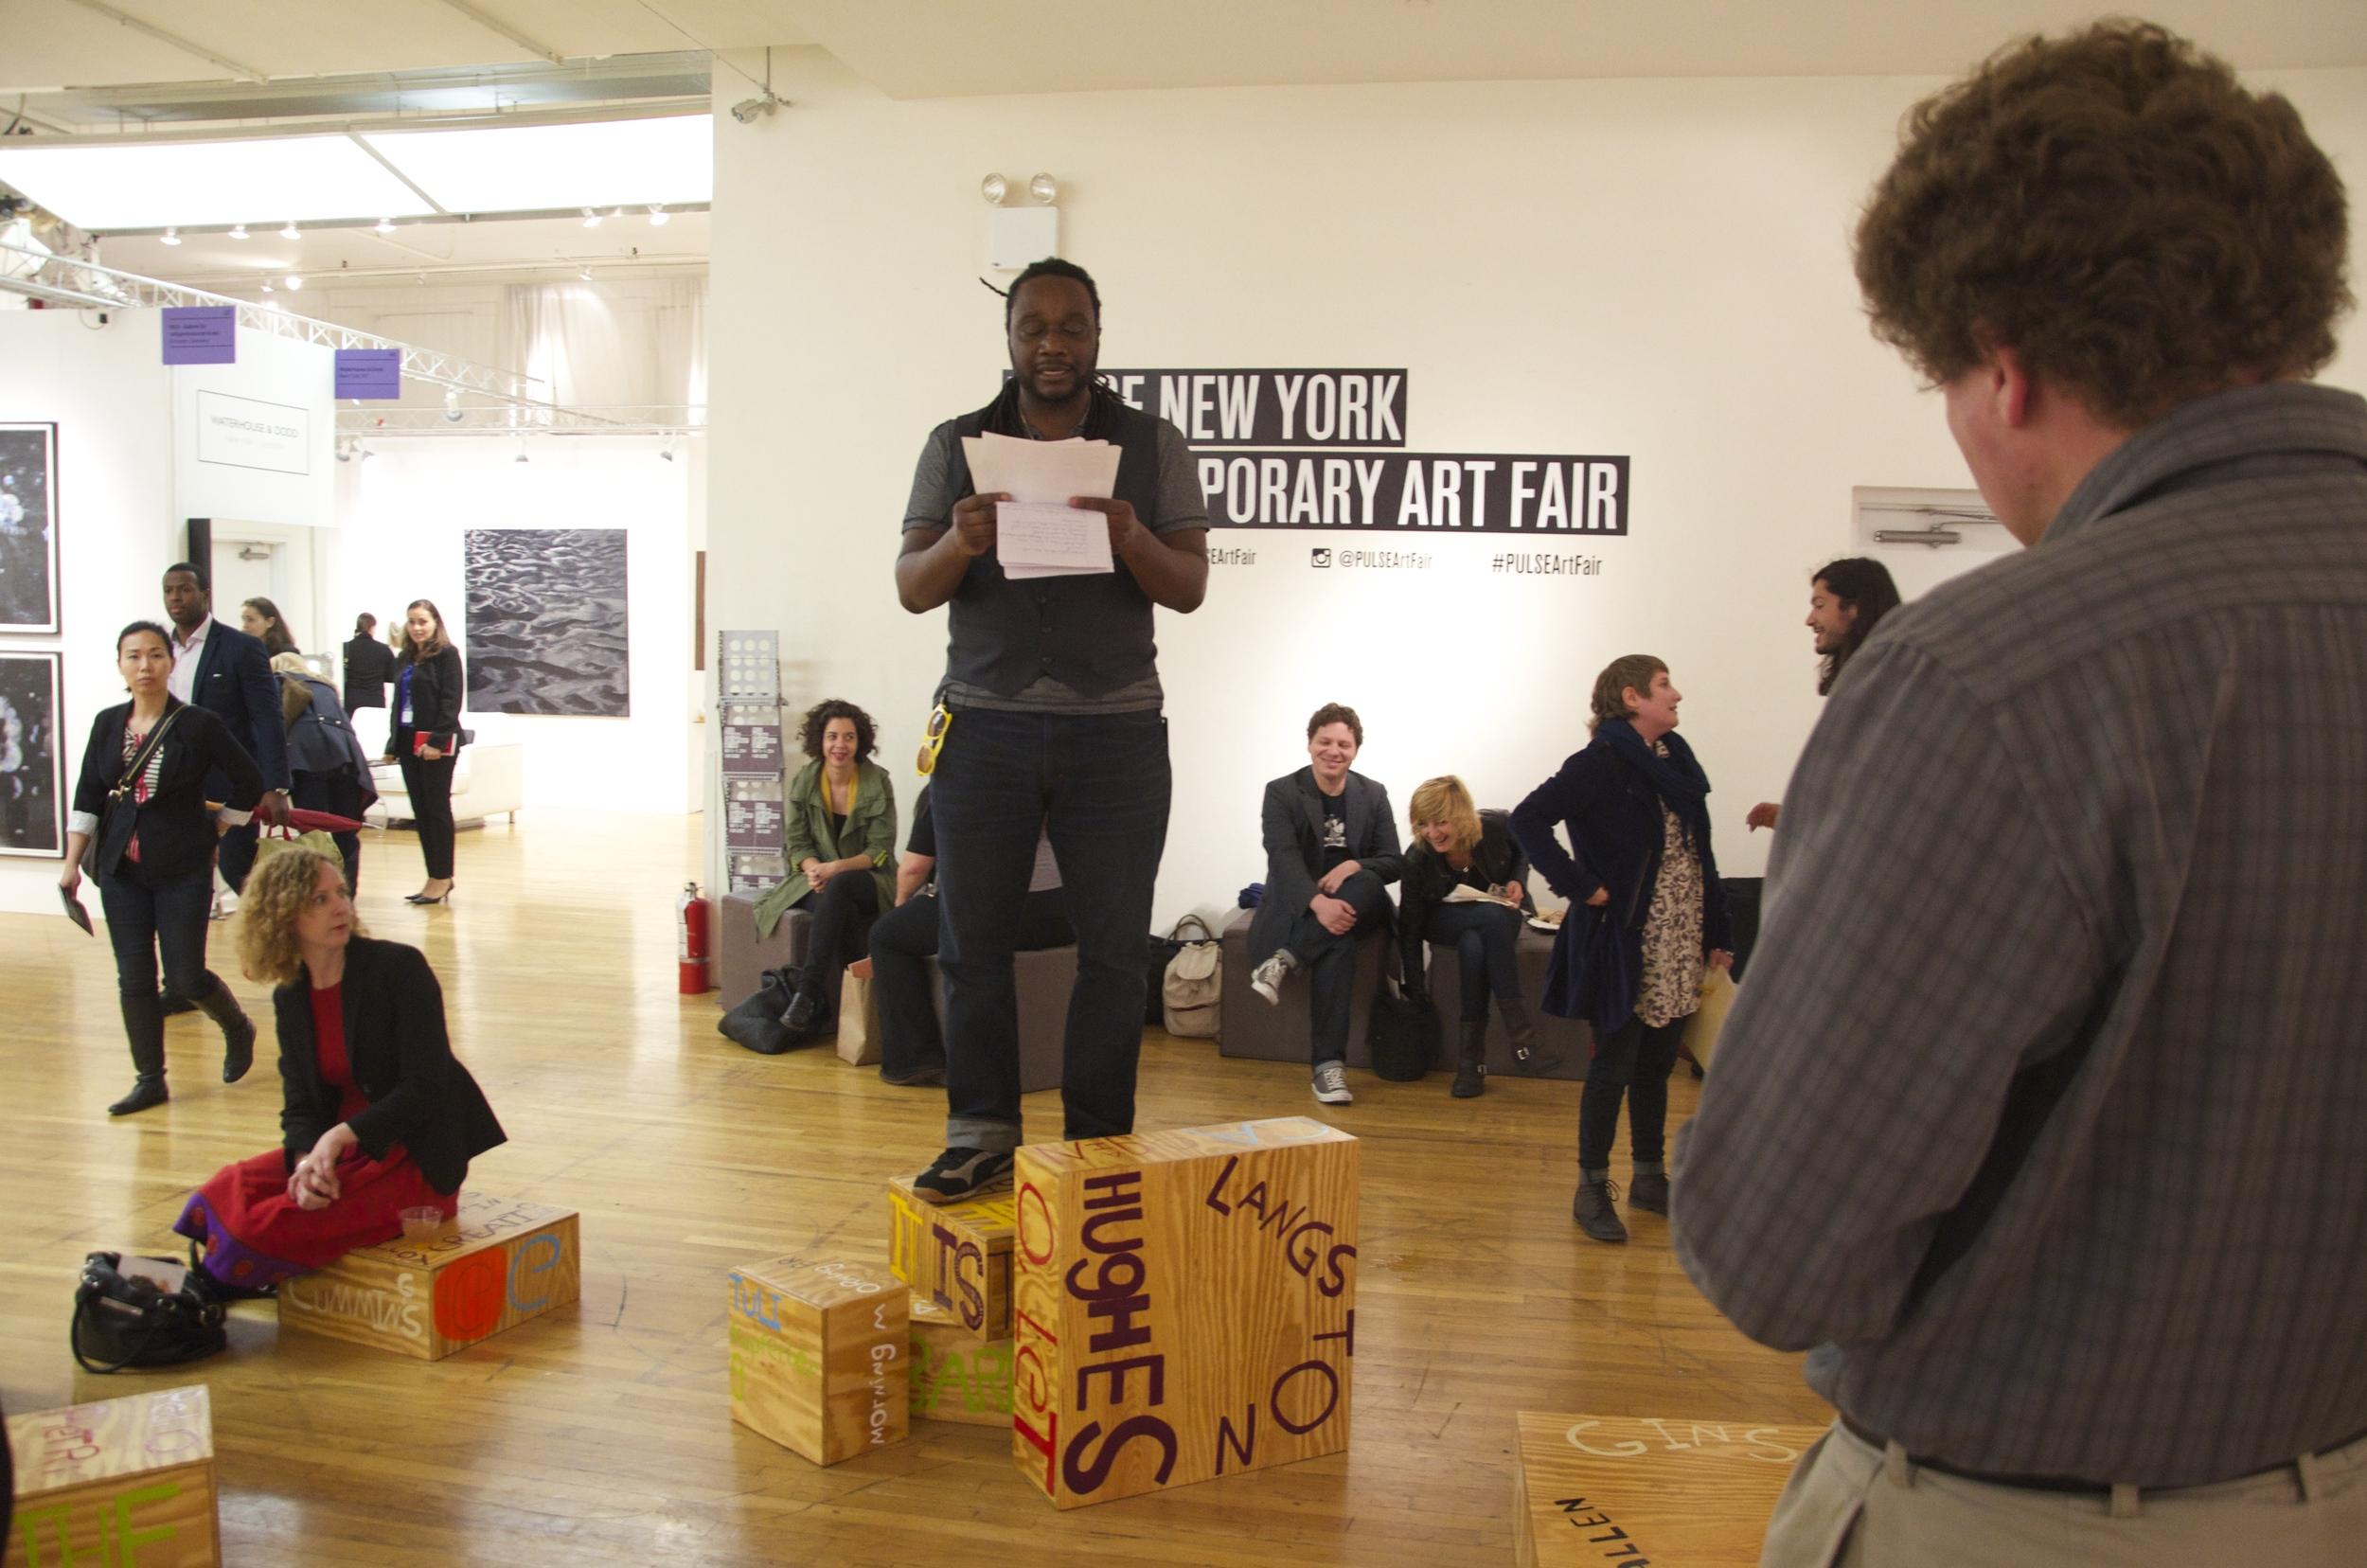 Poet Sculpture PULSE Art Fair, Michael Taylor, New York, NY 2014.jpg